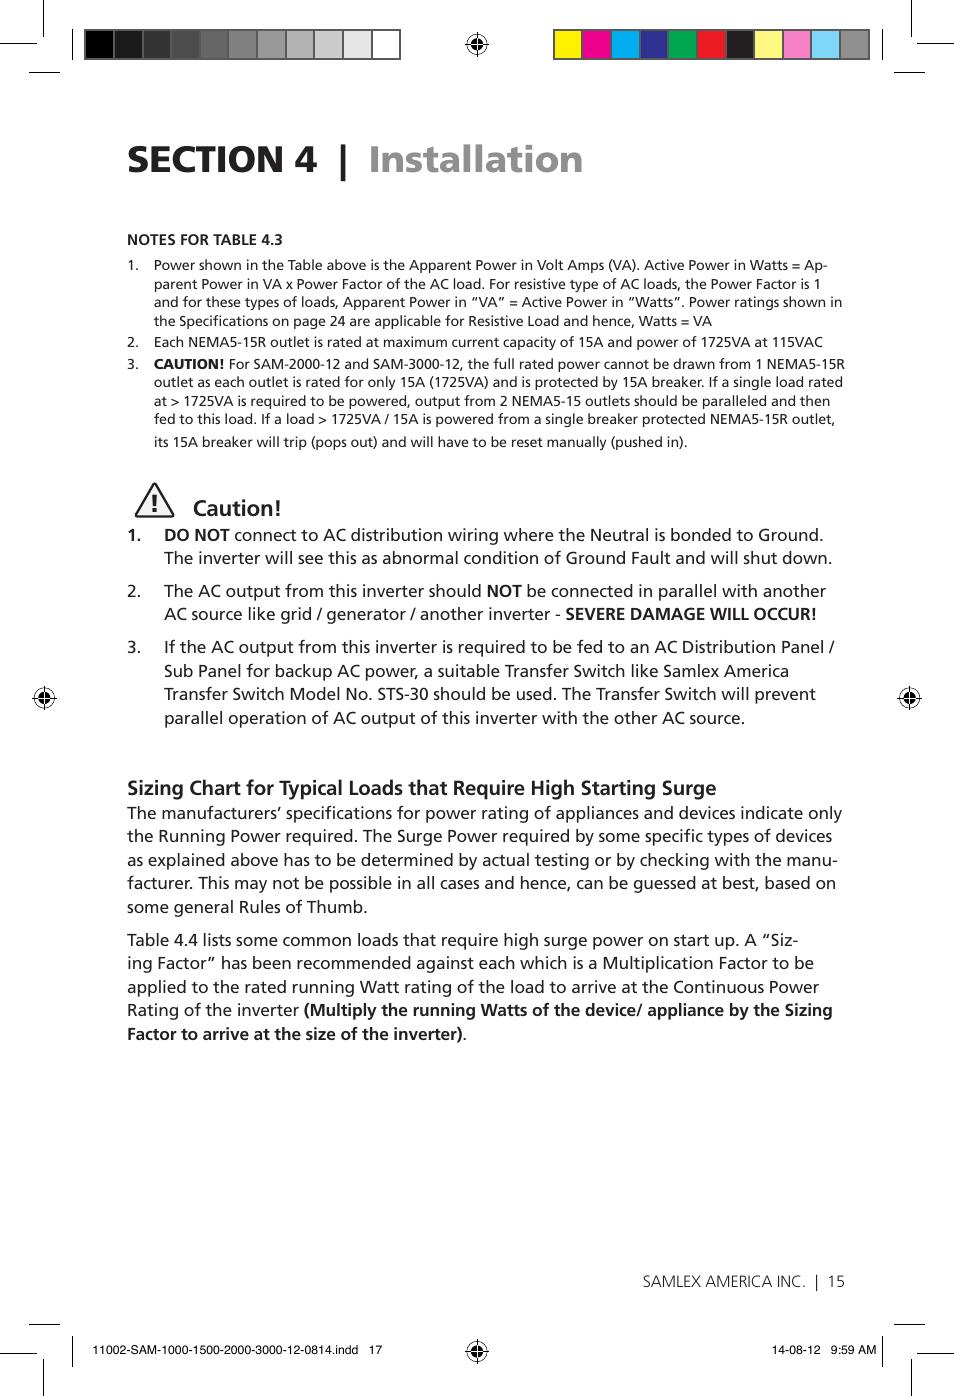 Caution   Samlex America SAM-3000-12 User Manual   Page 17 / 32